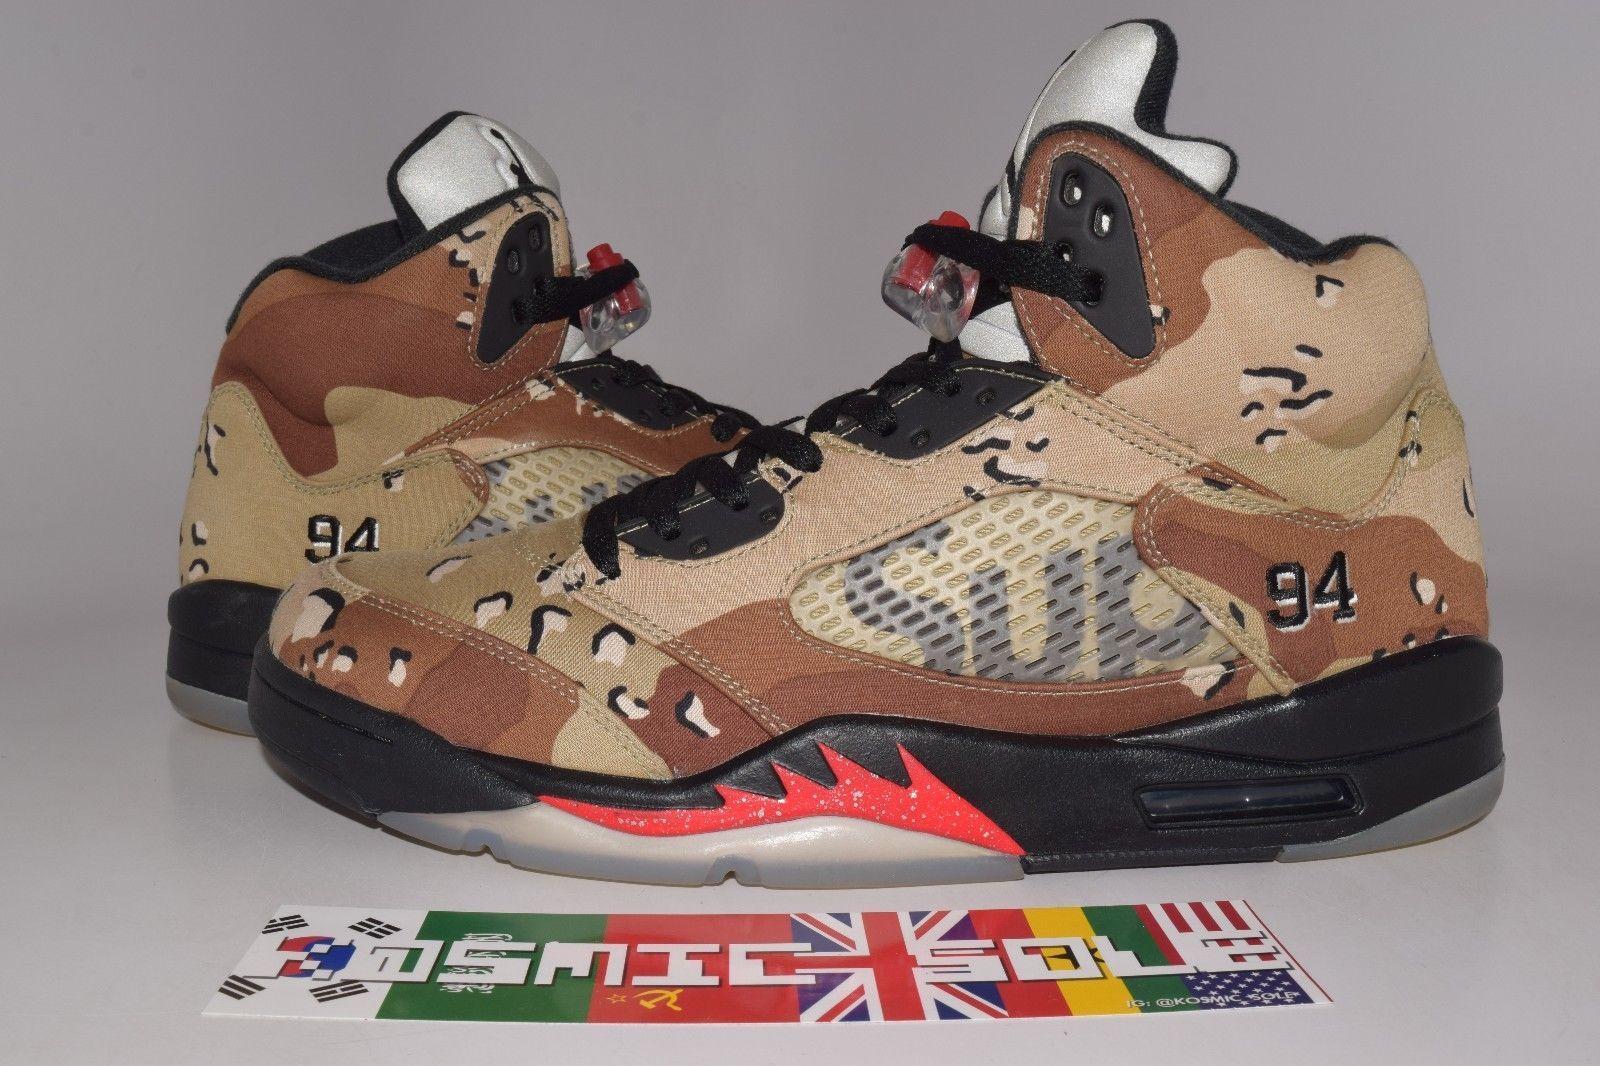 Nike Air Jordan 5 Retro Supreme Desert Camo Style # 824371